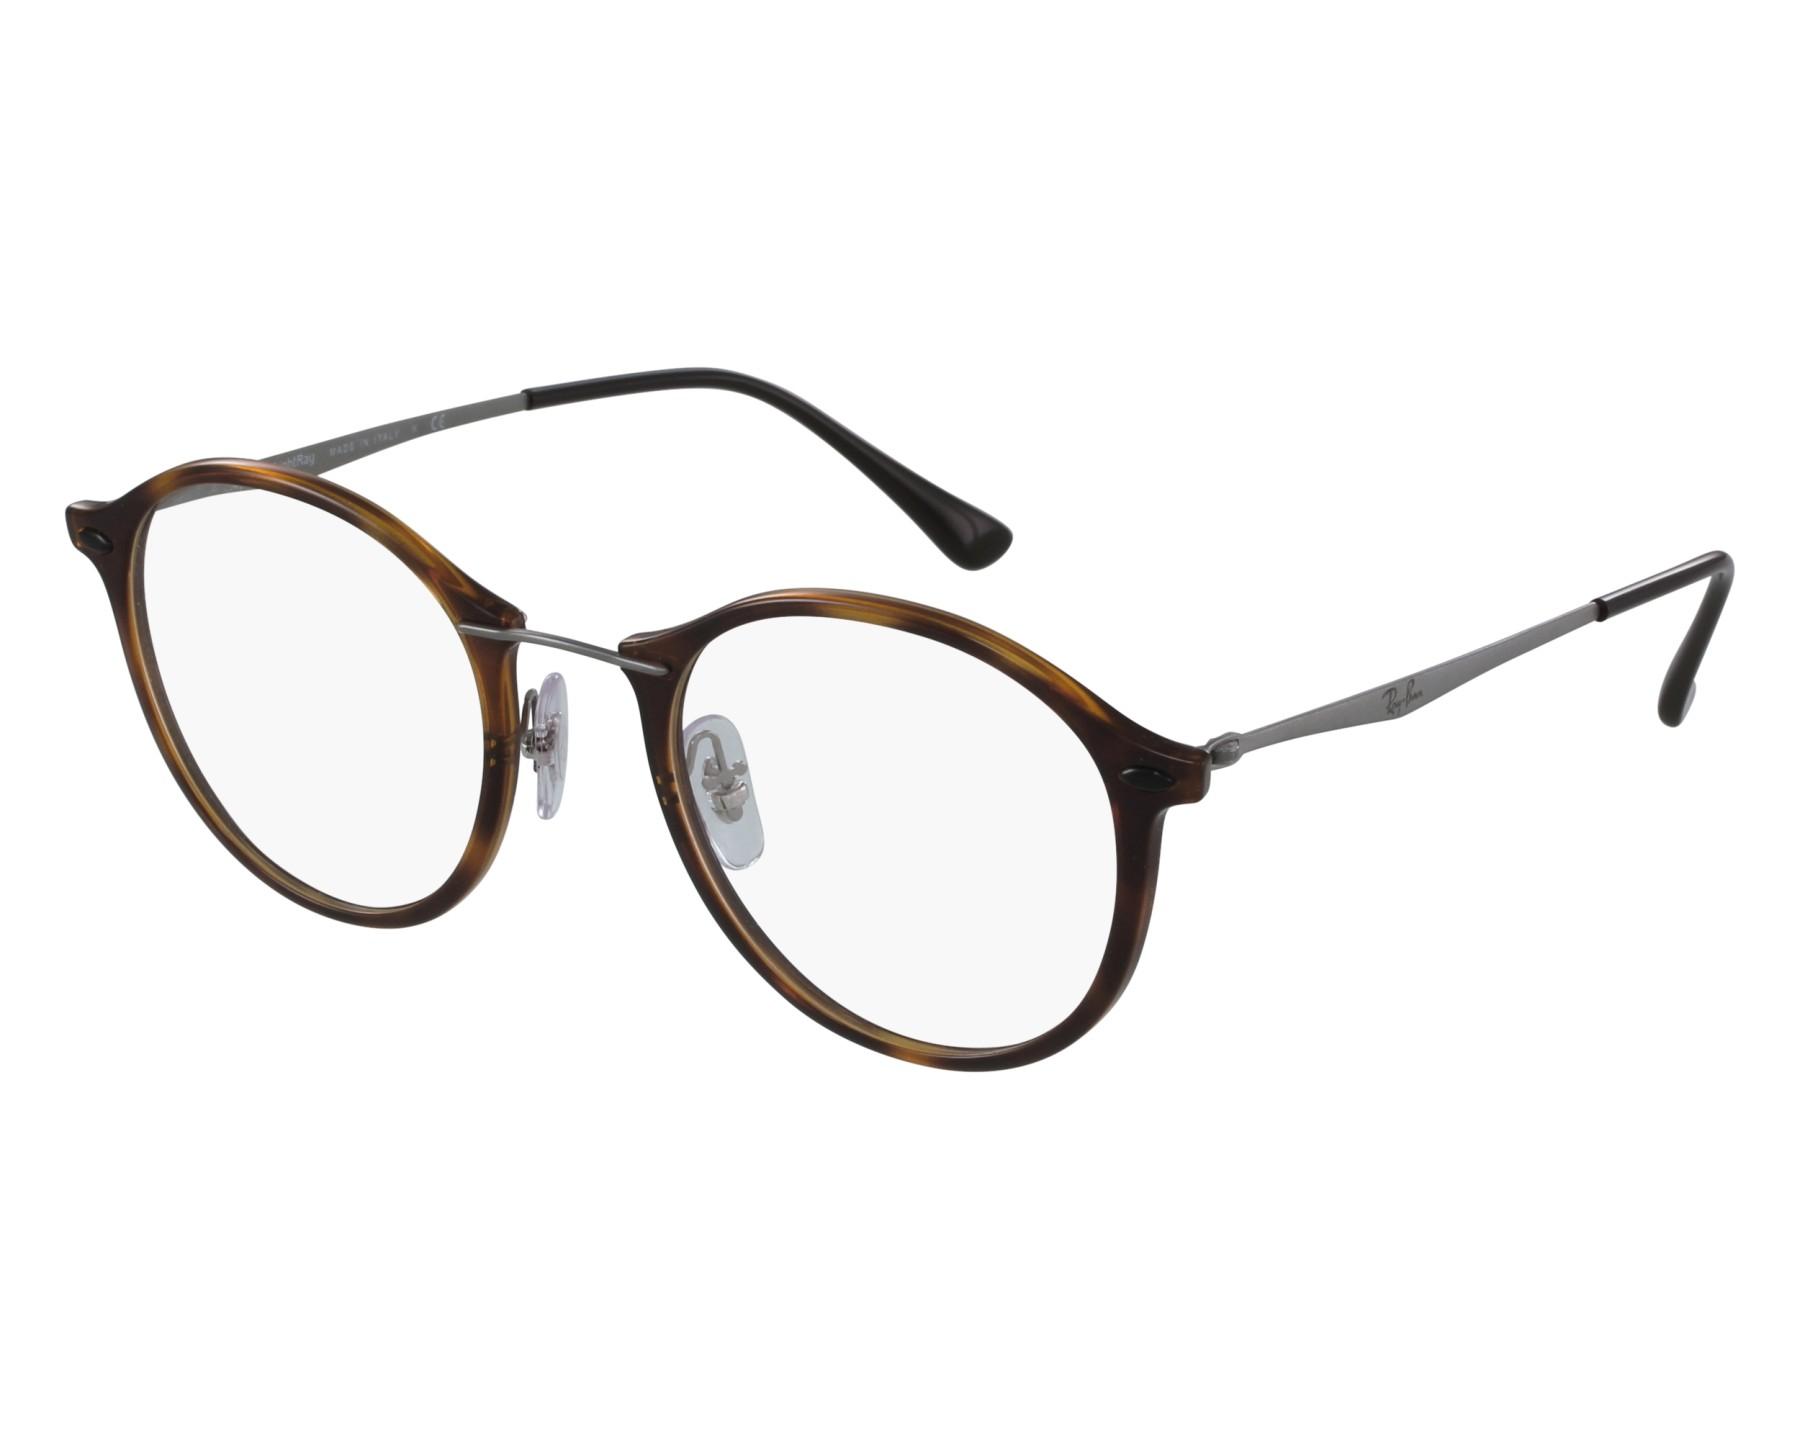 a5504a21f8 eyeglasses Ray-Ban RX-7073 5588 47-21 Havana Grey front view